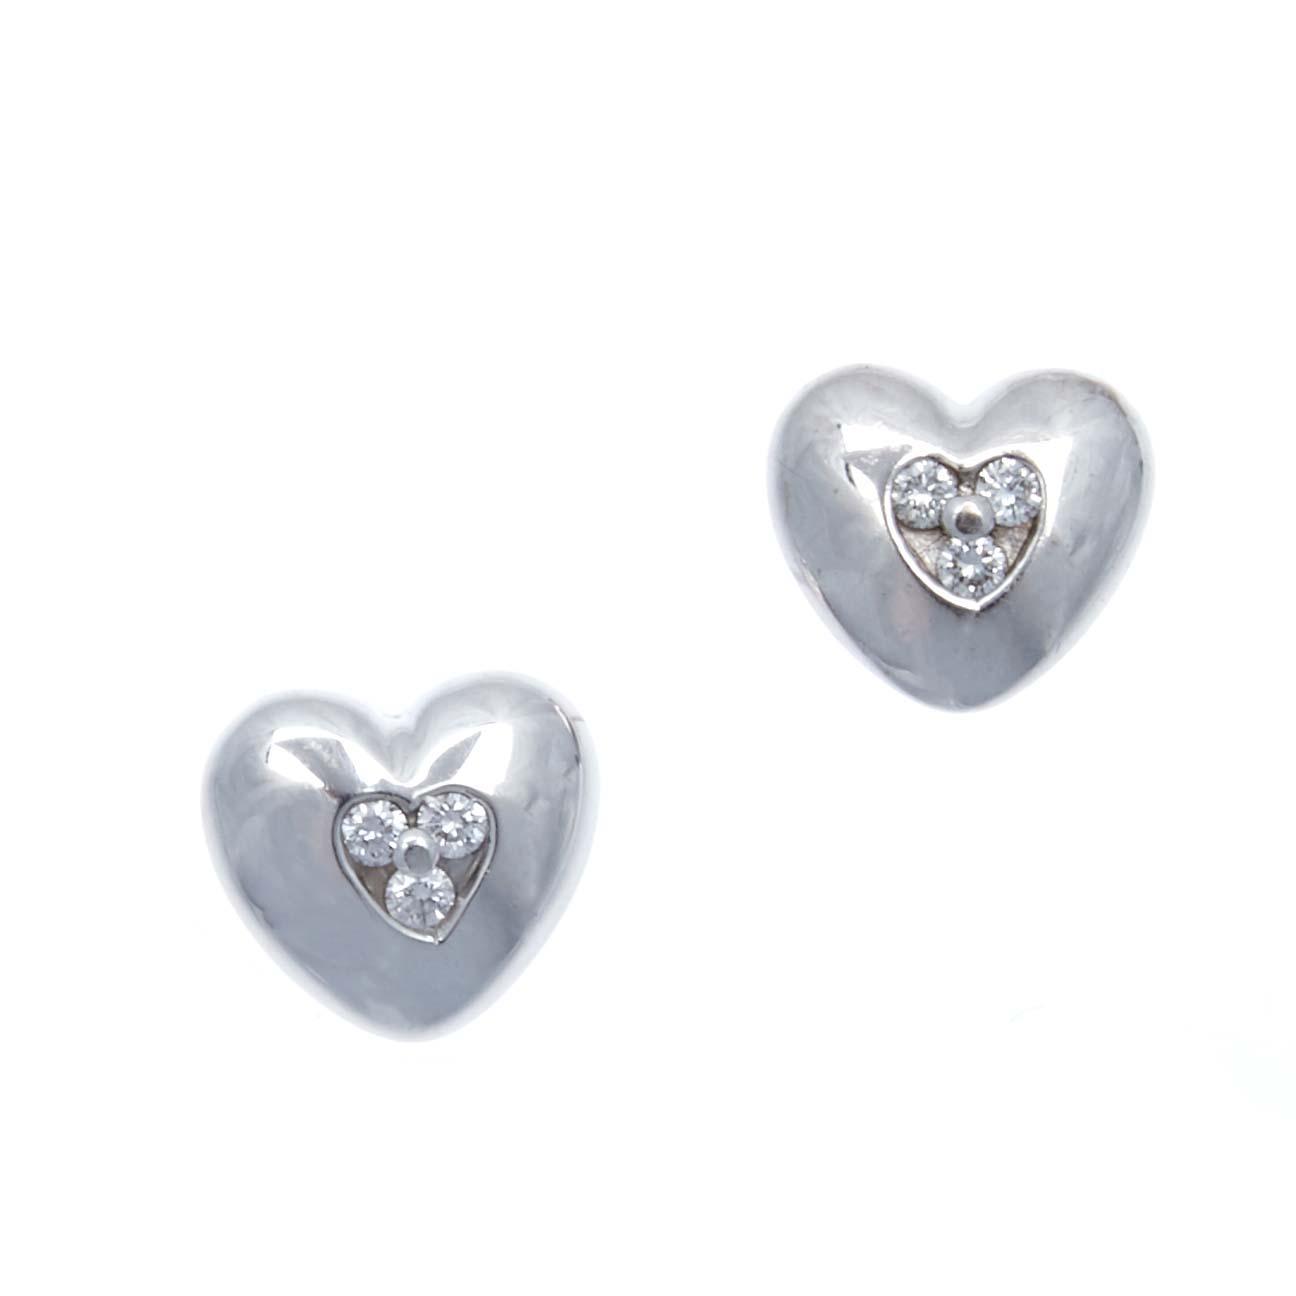 18ct Tiffany Co Diamond Heart Earrings Price Estimate 750